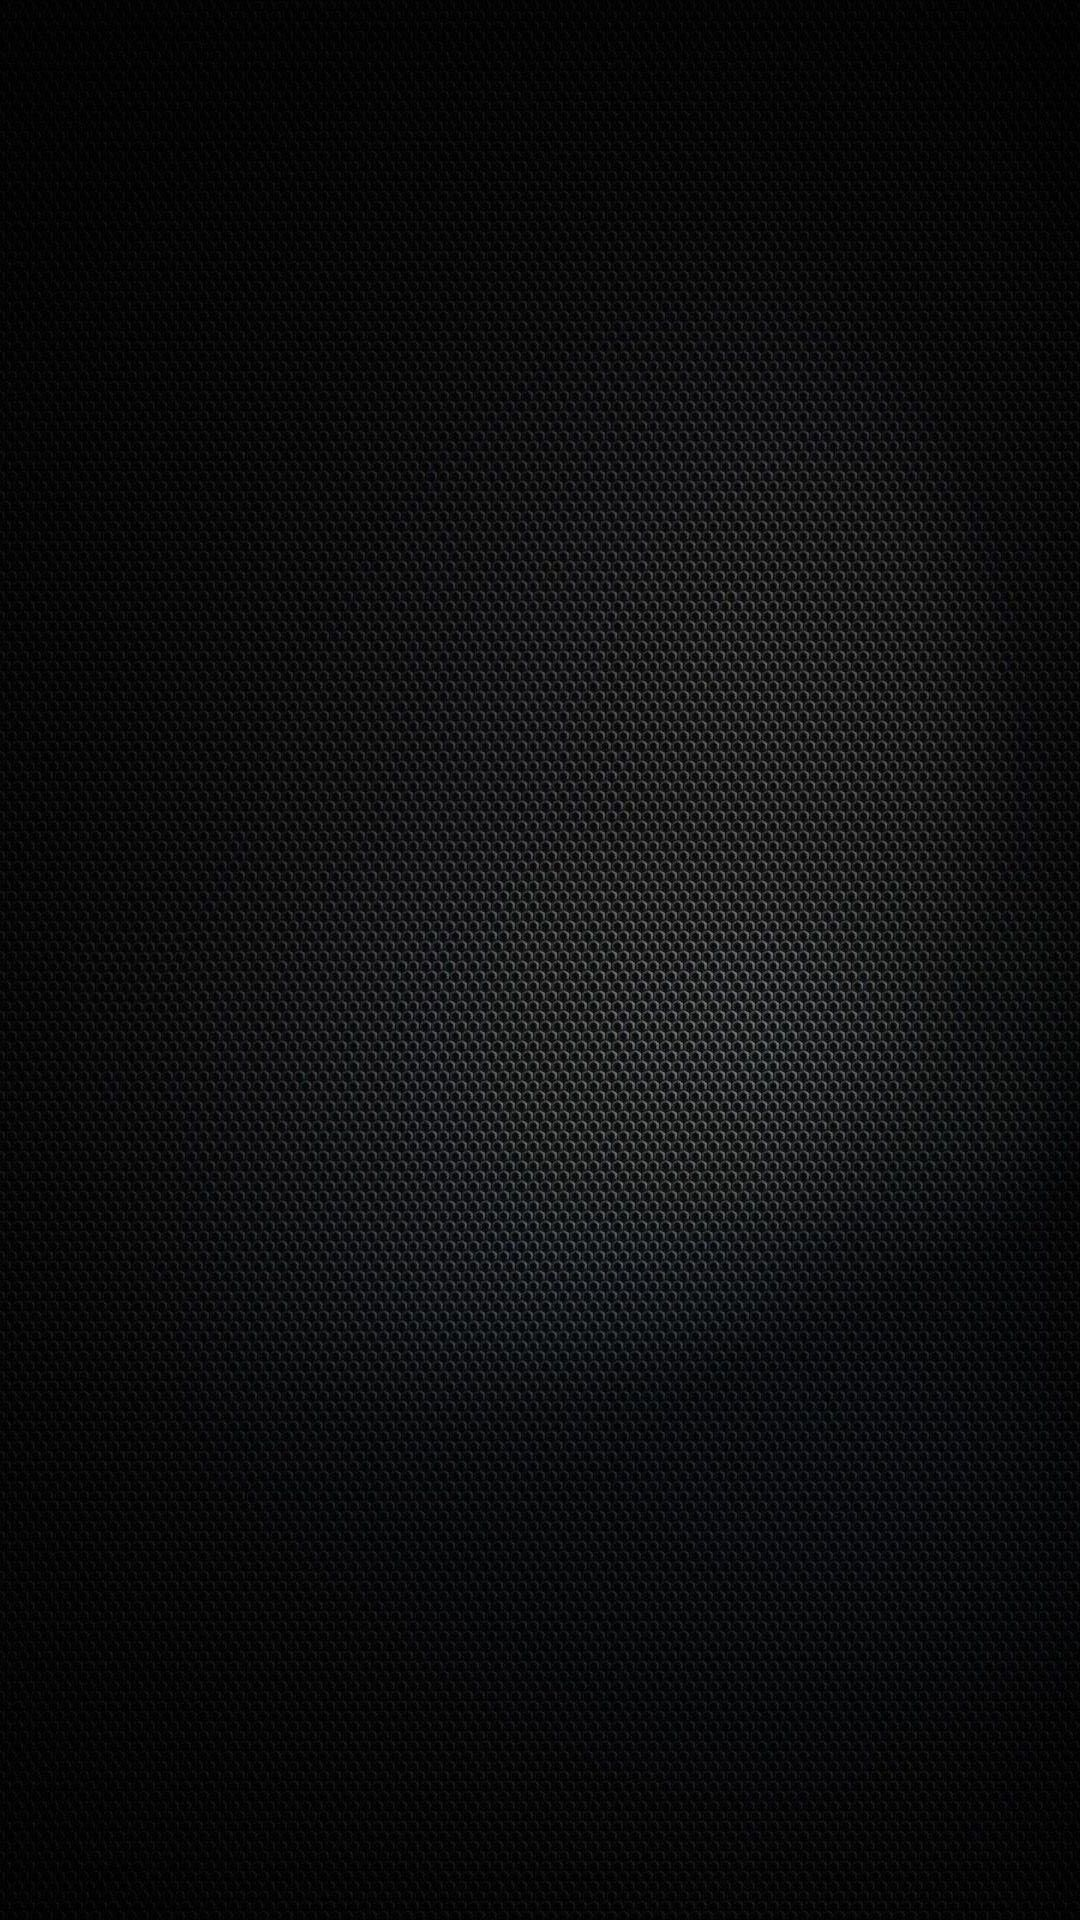 Dark Theme Wallpaper Android wallpaper dark, Samsung